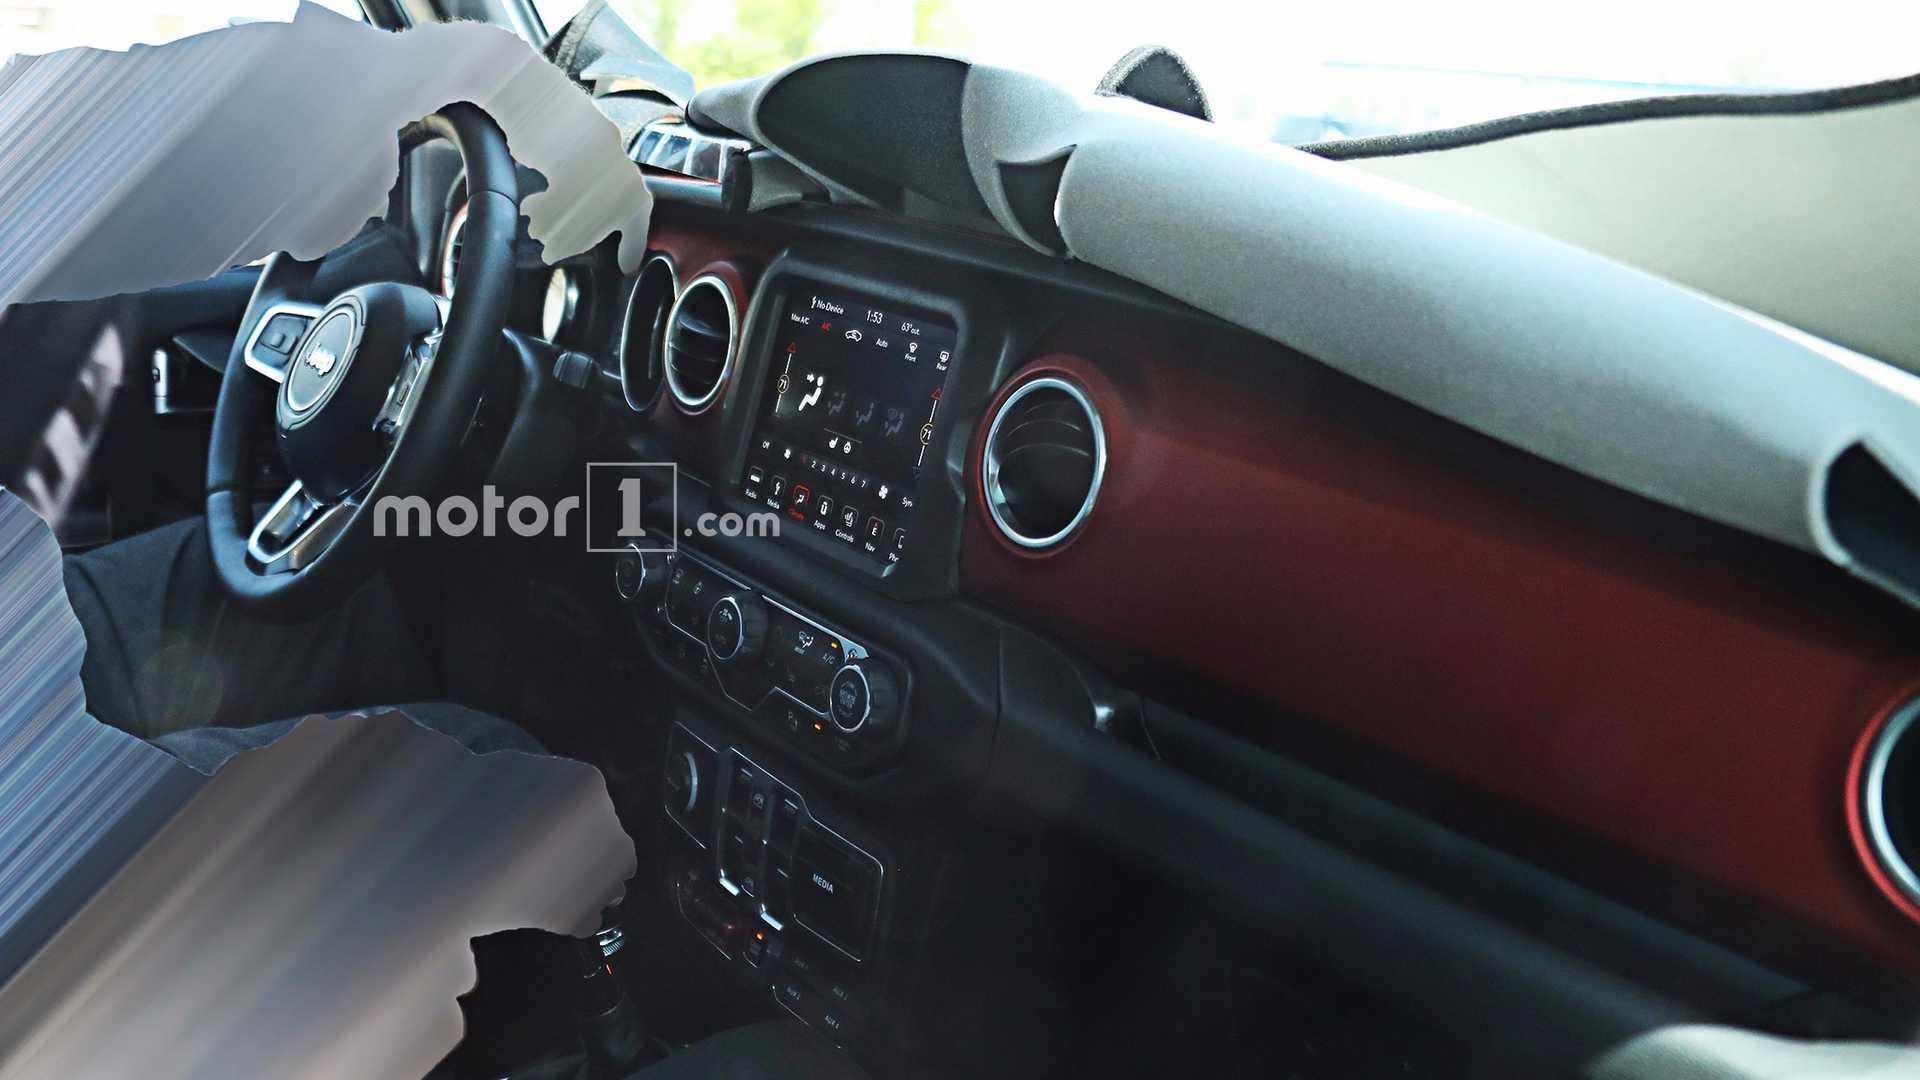 2018 Jeep Wrangler Interior Fully Revealed >> 2018 Jeep Wrangler's Interior Fully Revealed In New Spy Photos